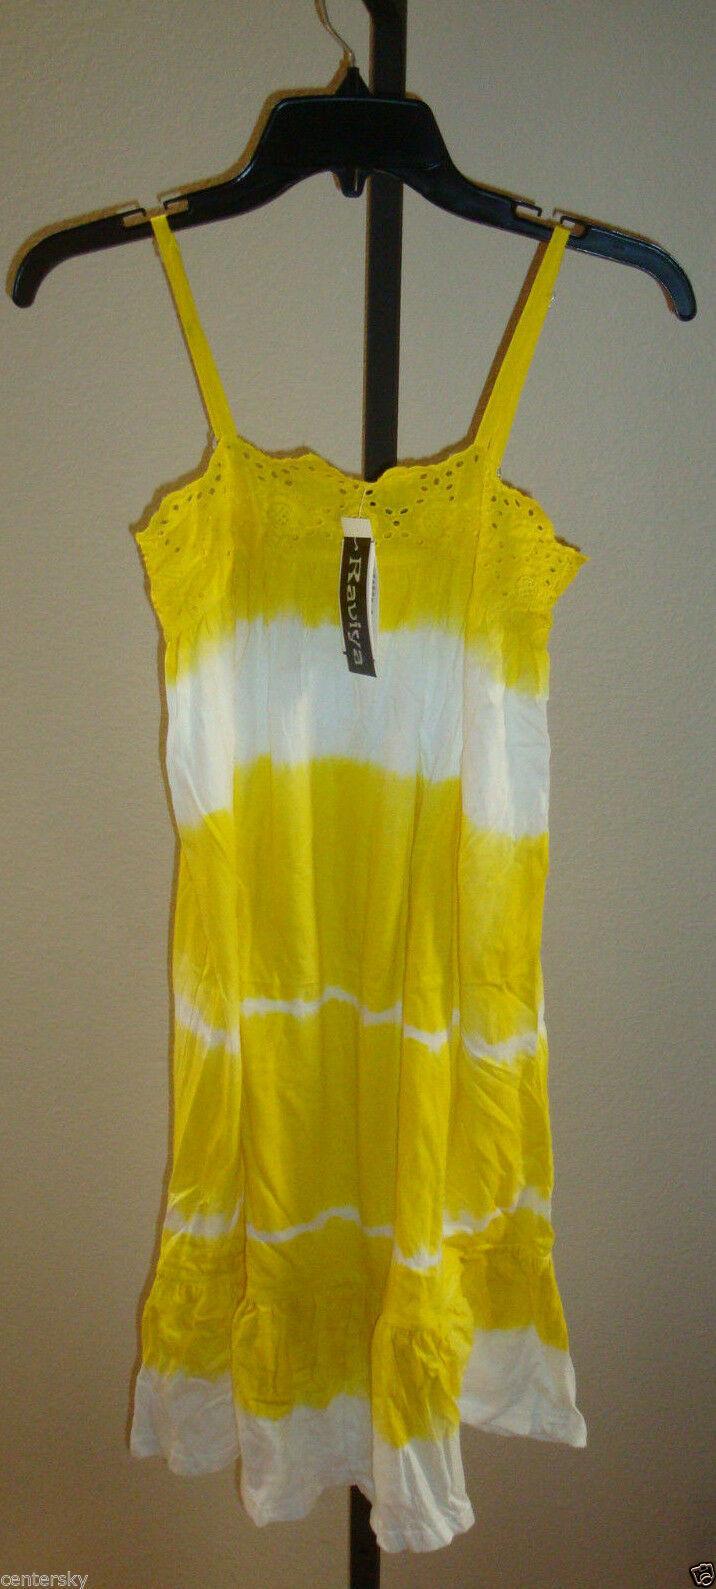 New $39 Raviya Women's Swimsuit Cover-up Lounge Beach Dress Yellow Wht Tie Dye S